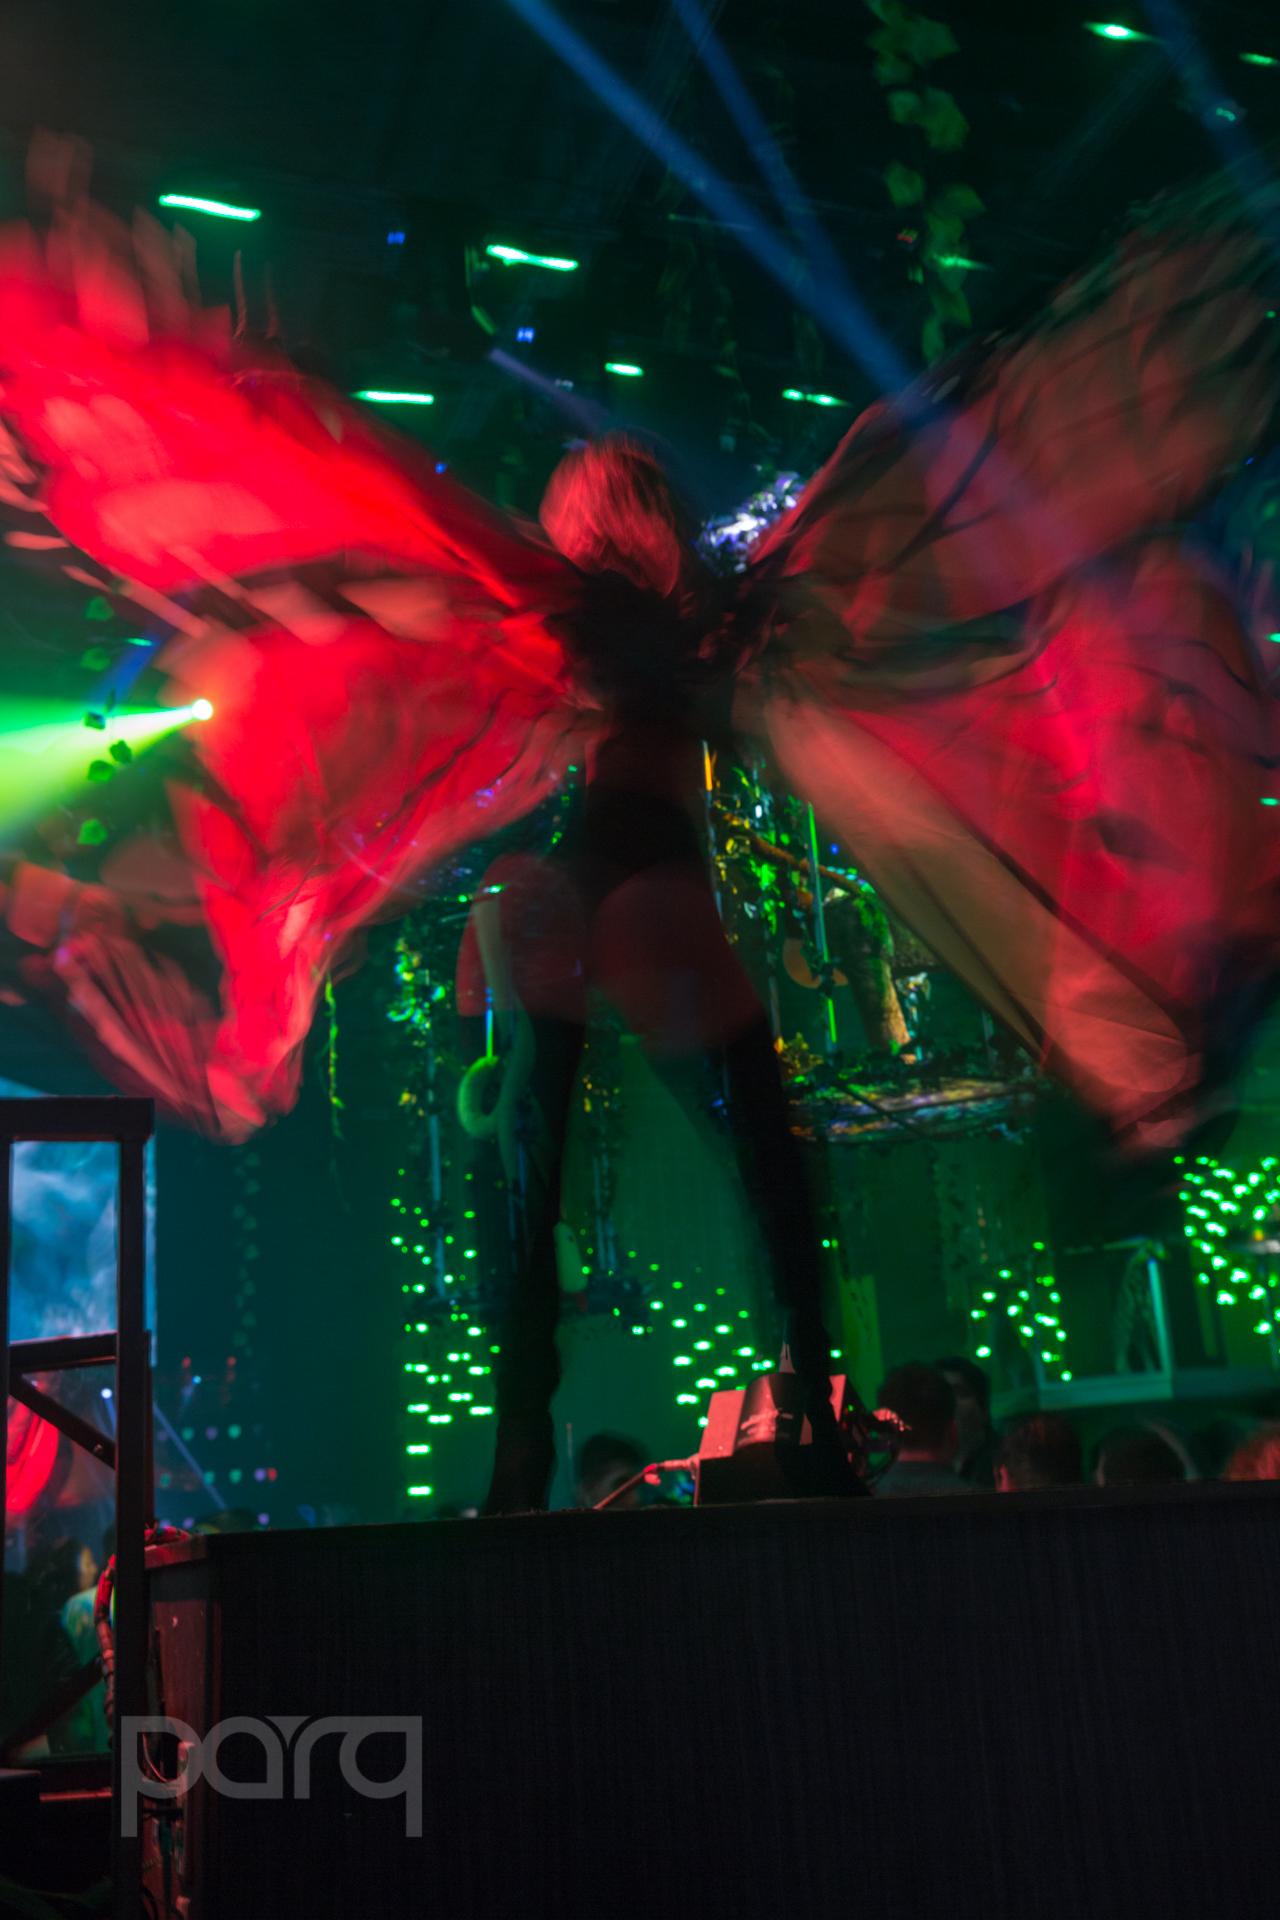 San-Diego-Nightclub-Zoo Funktion-37.jpg